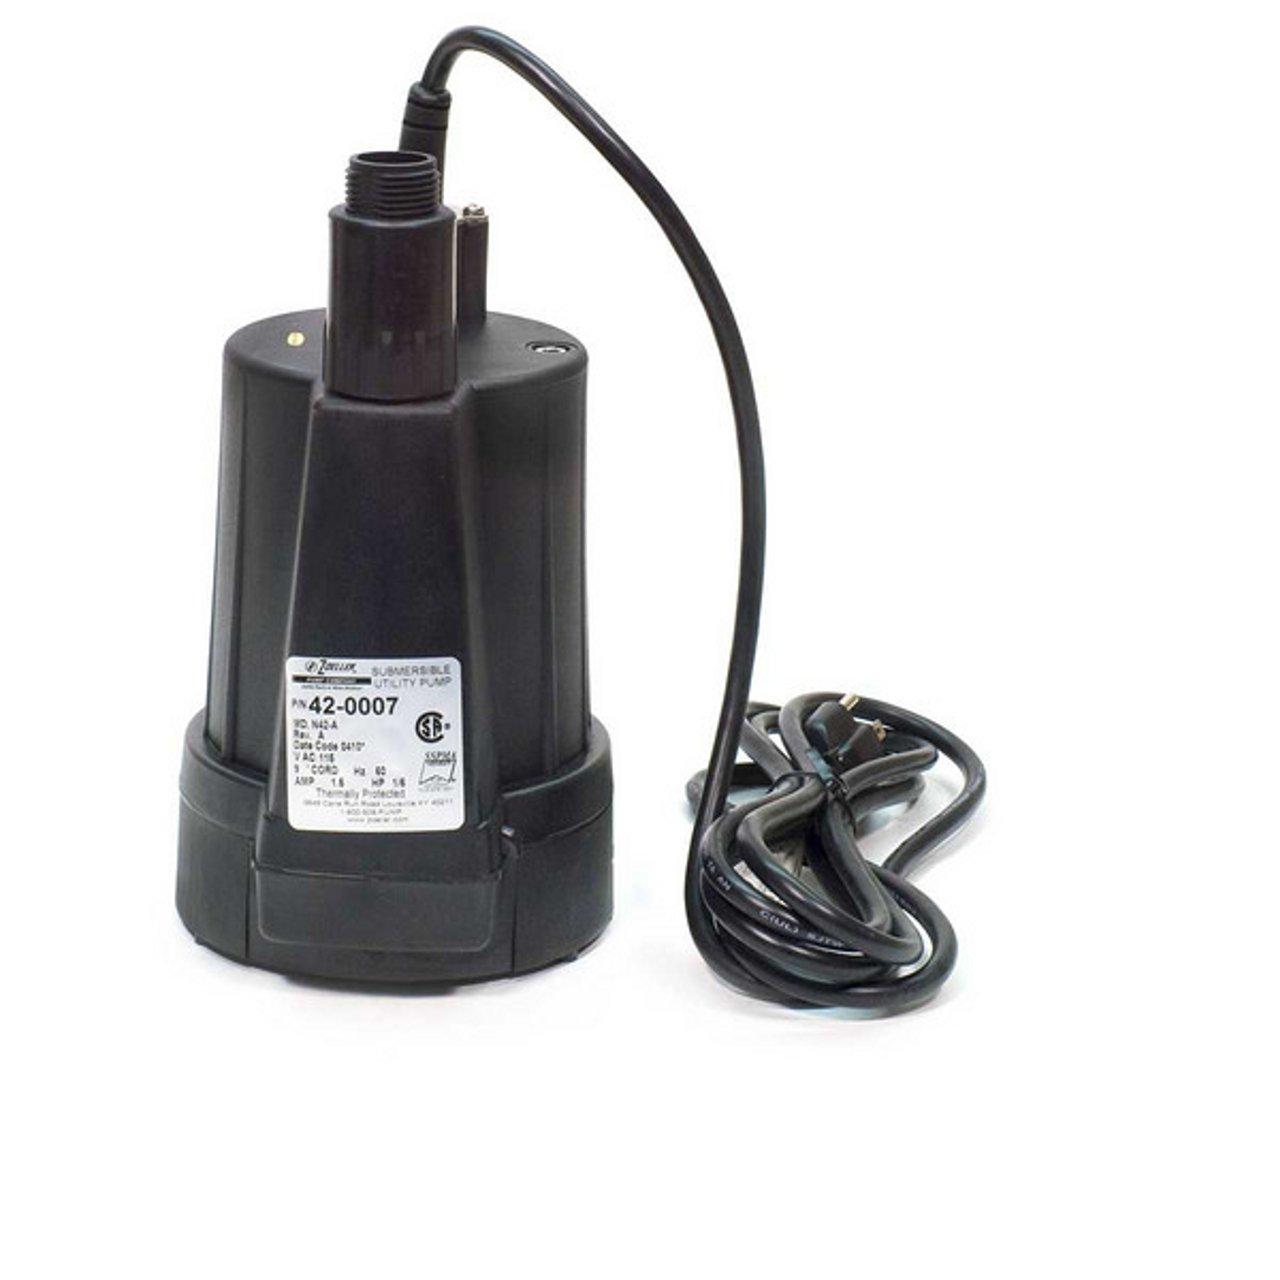 Zoeller 42-0007 115-Volt 1/6 Horse Power Model N42 Floor Sucker Non-Automatic Utility Pump